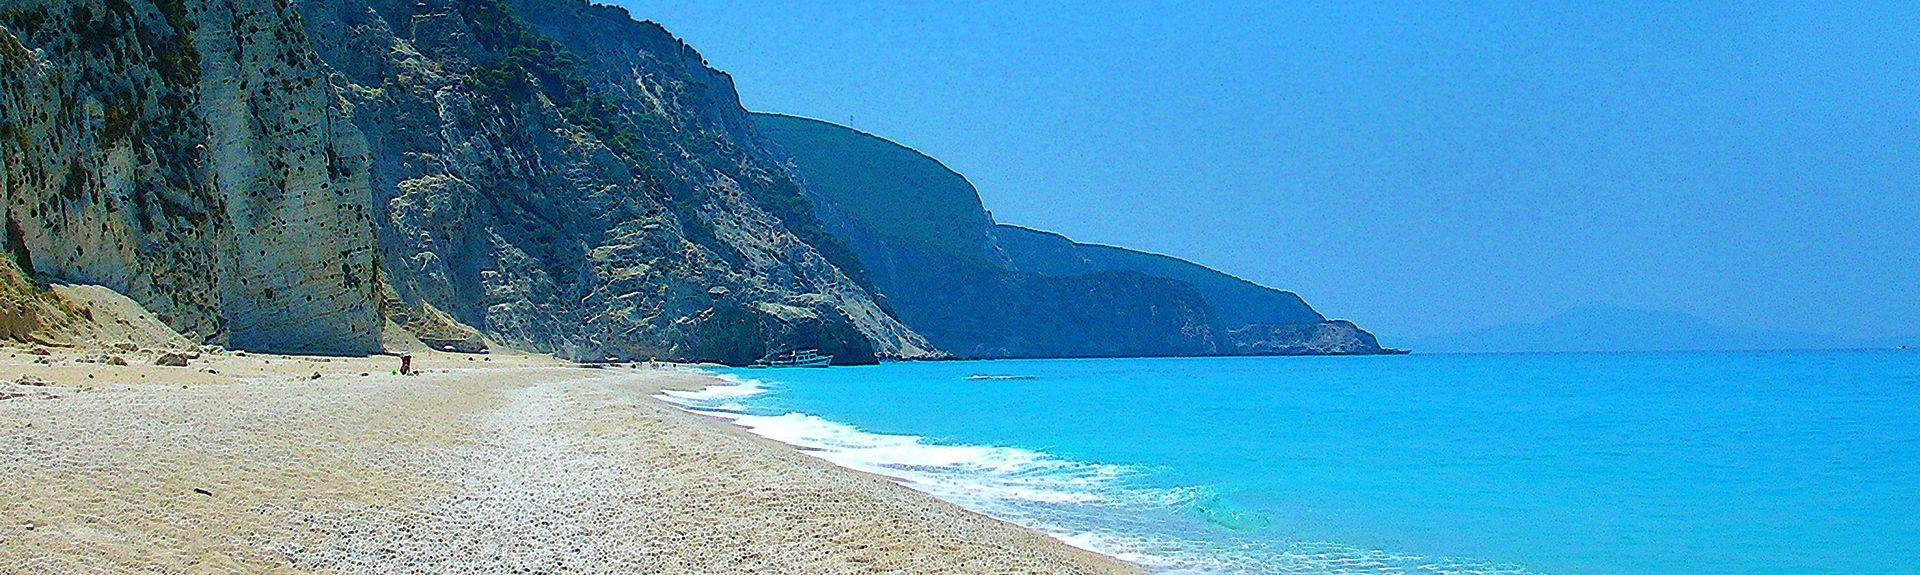 Nidri, Peloponnes, Grækenland